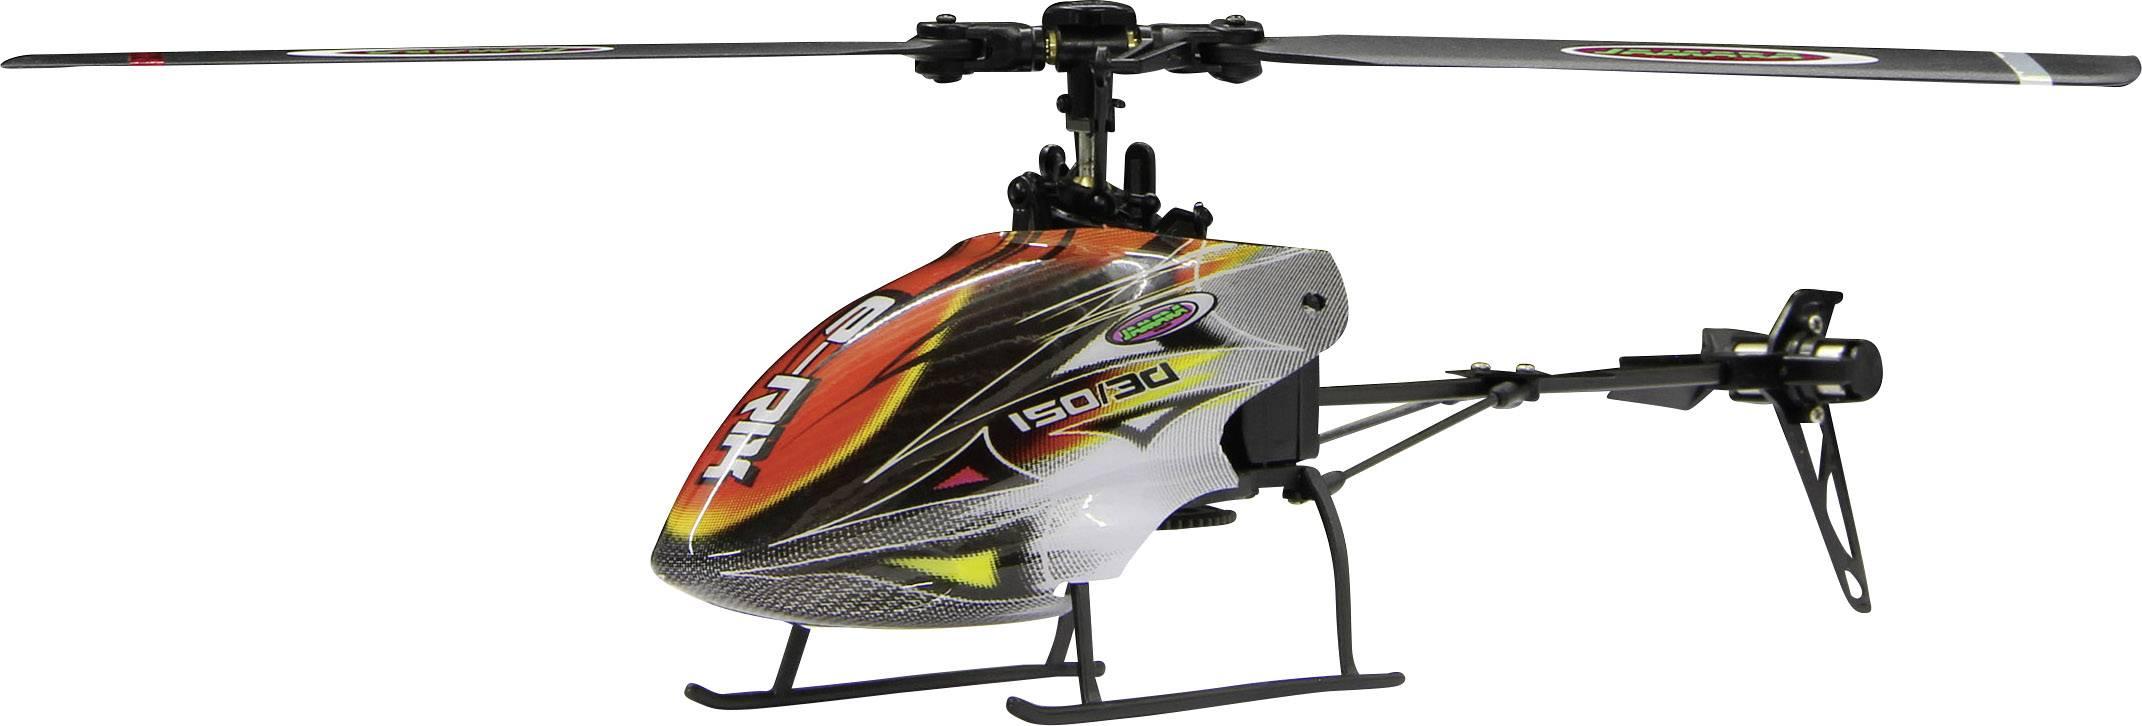 Elicottero 3d Model : Segnale pericolo elicottero stock photo more pictures of